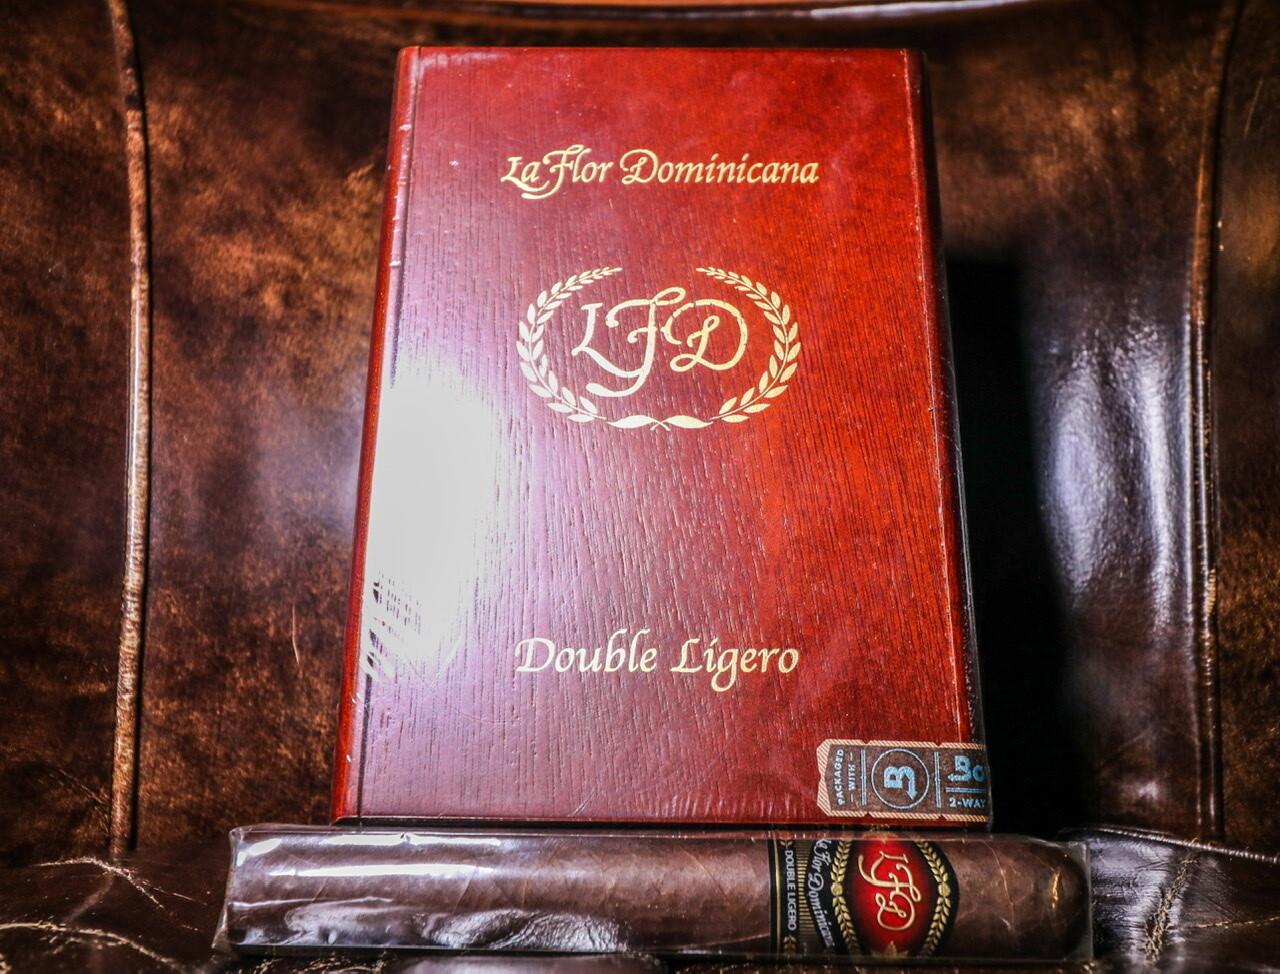 LFD Double Ligero DL-700 MADURO, 6-1/2X60, 20's DL700